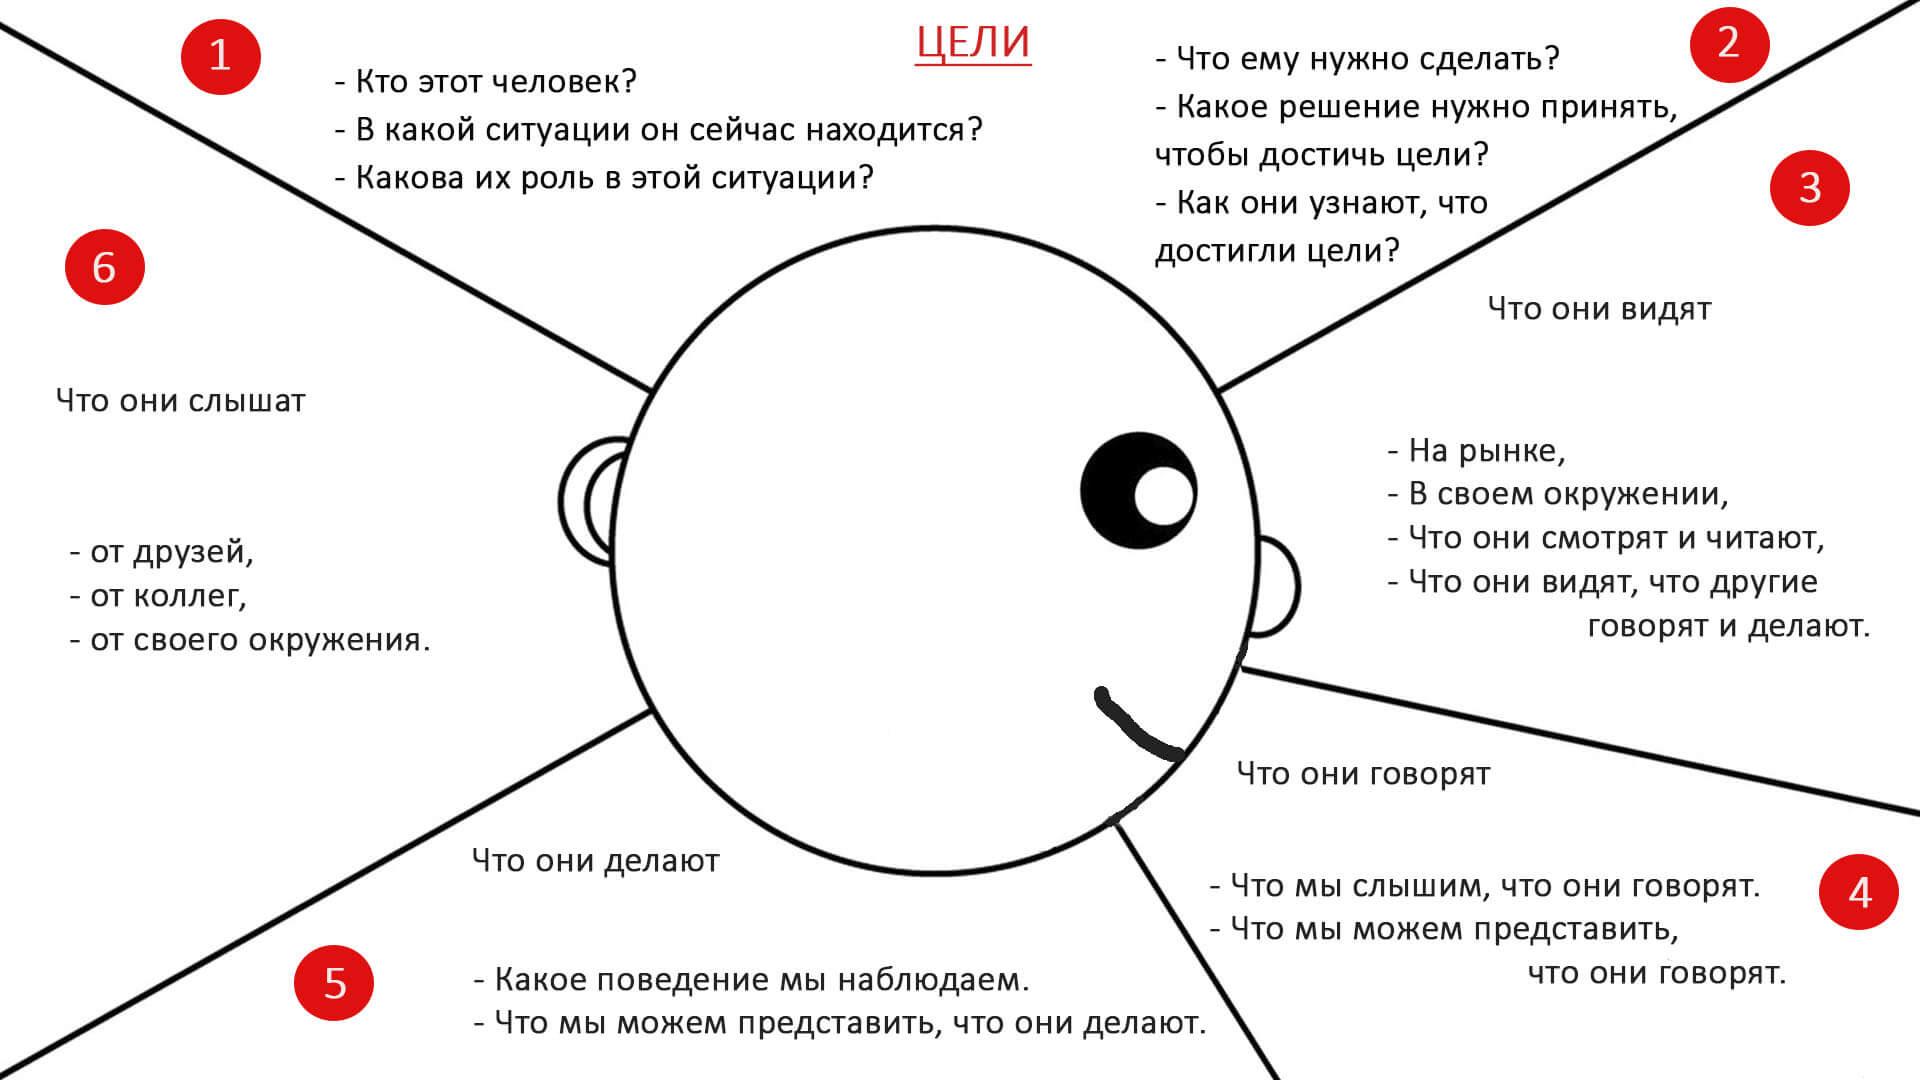 карта эмпатии шаблон